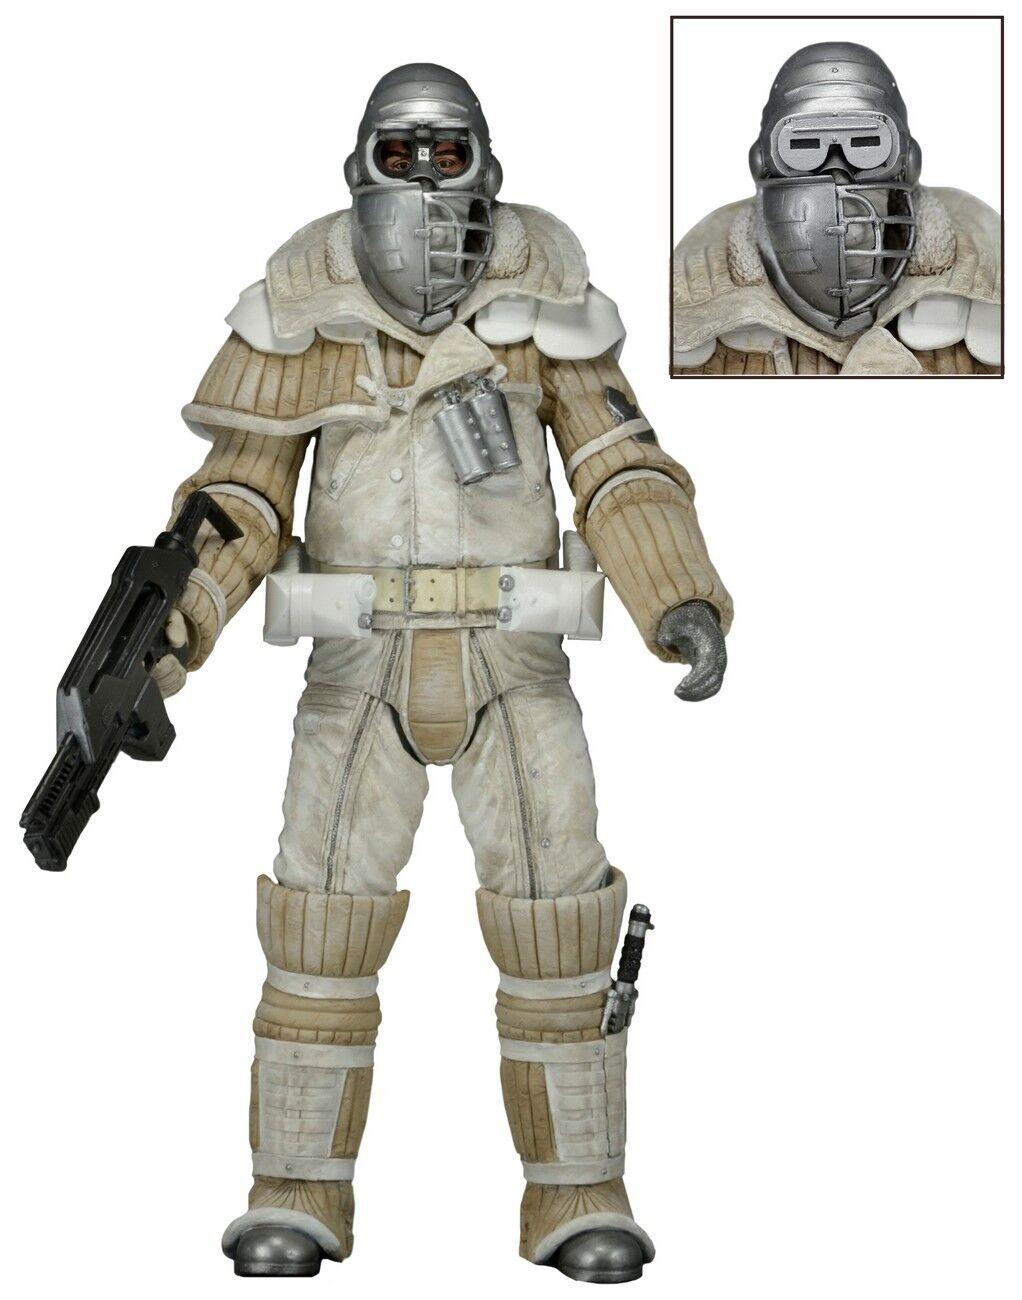 NECA Aliens Series 8 Weyland-Yutani Commando Commando Commando Action Figure - New 4b6aed